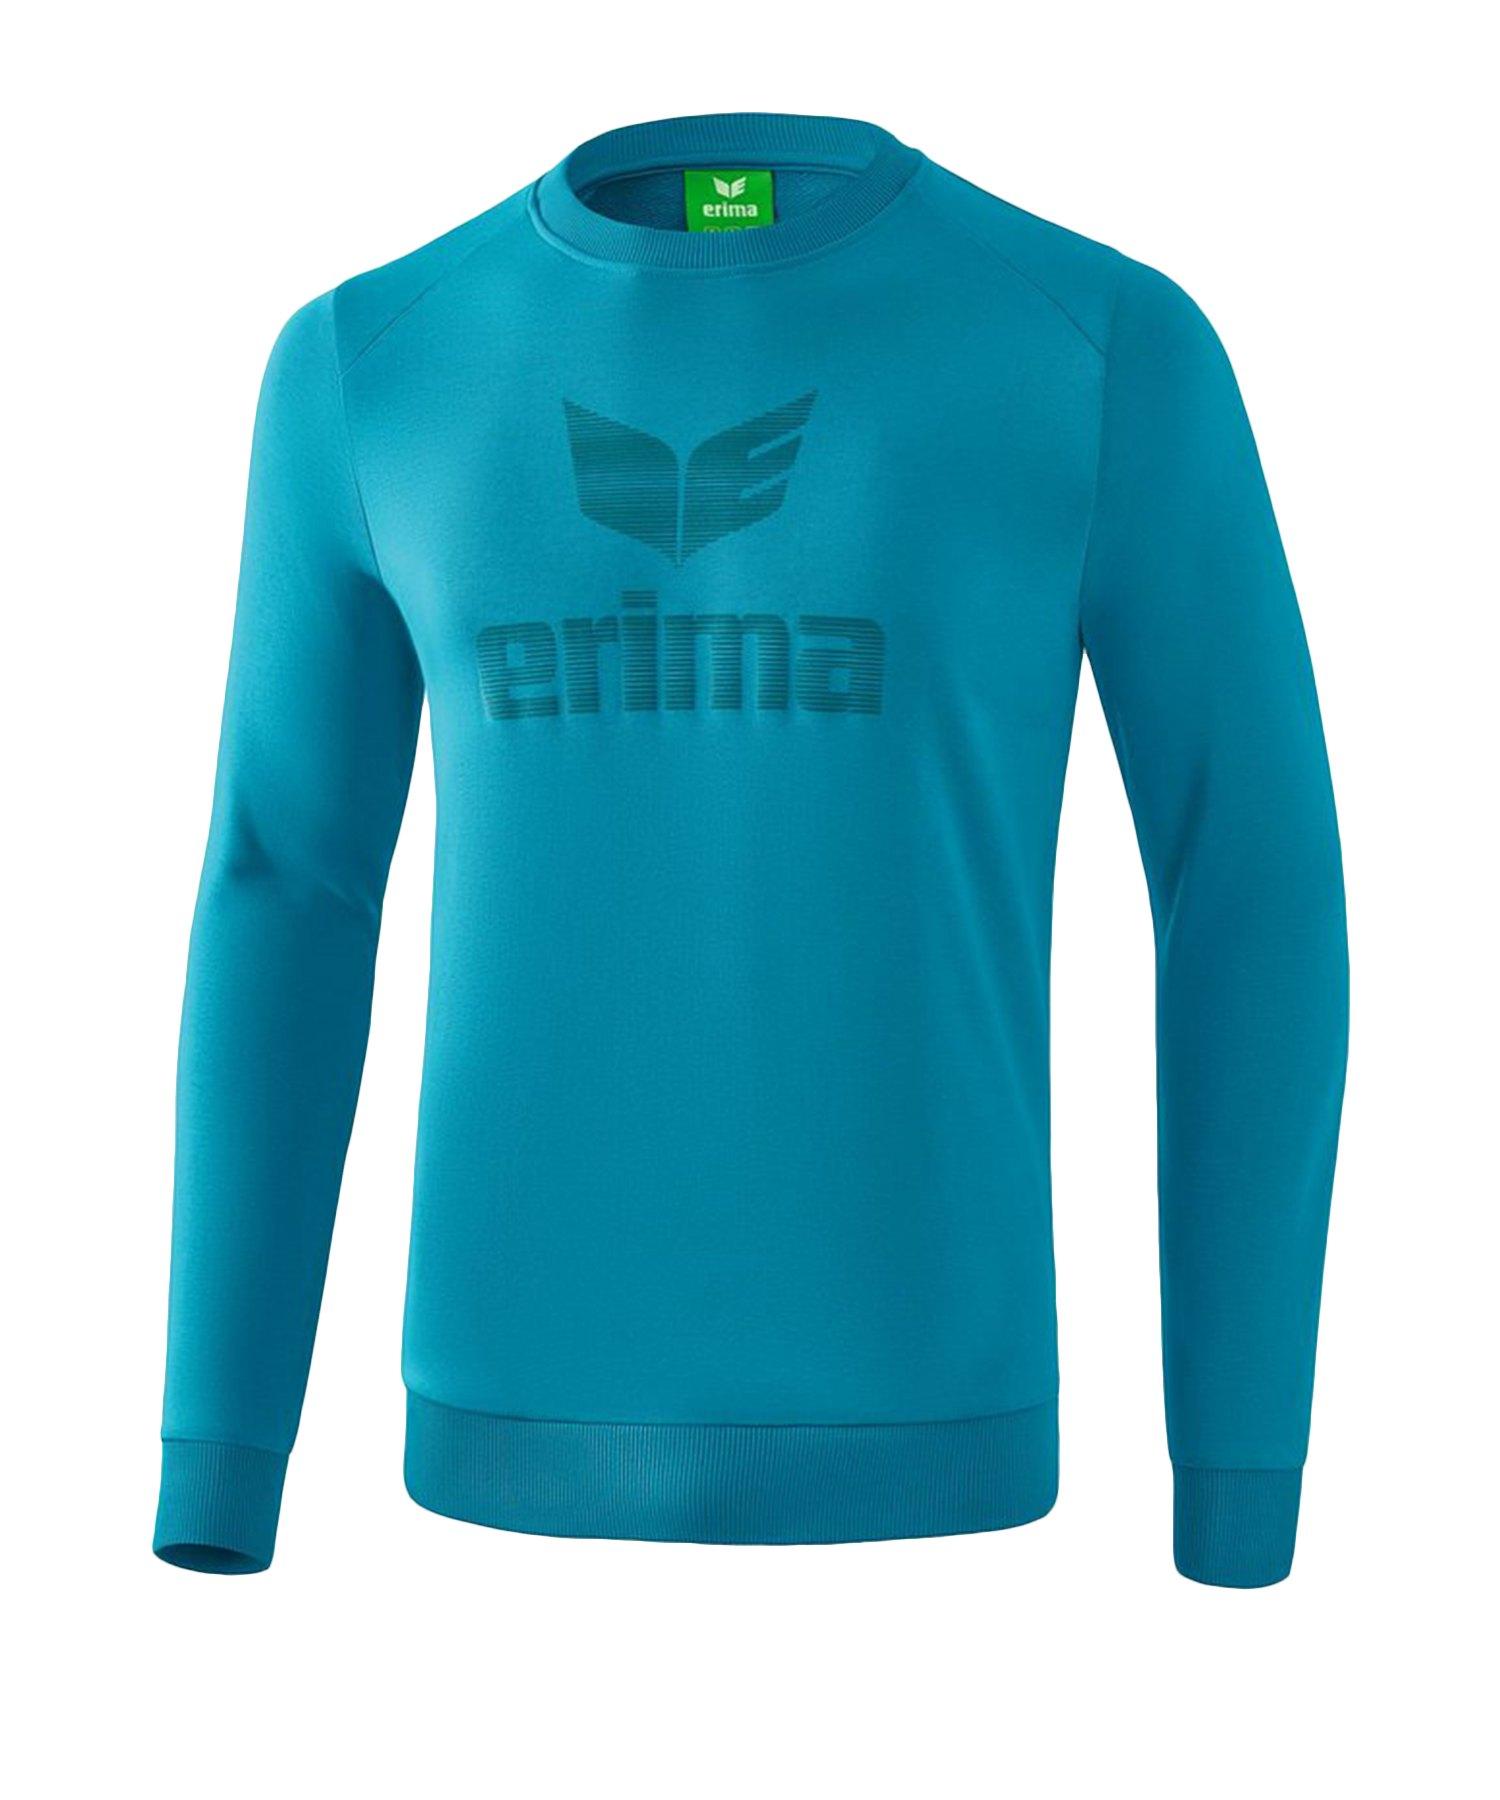 Erima Essential Sweatshirt Blau - Blau